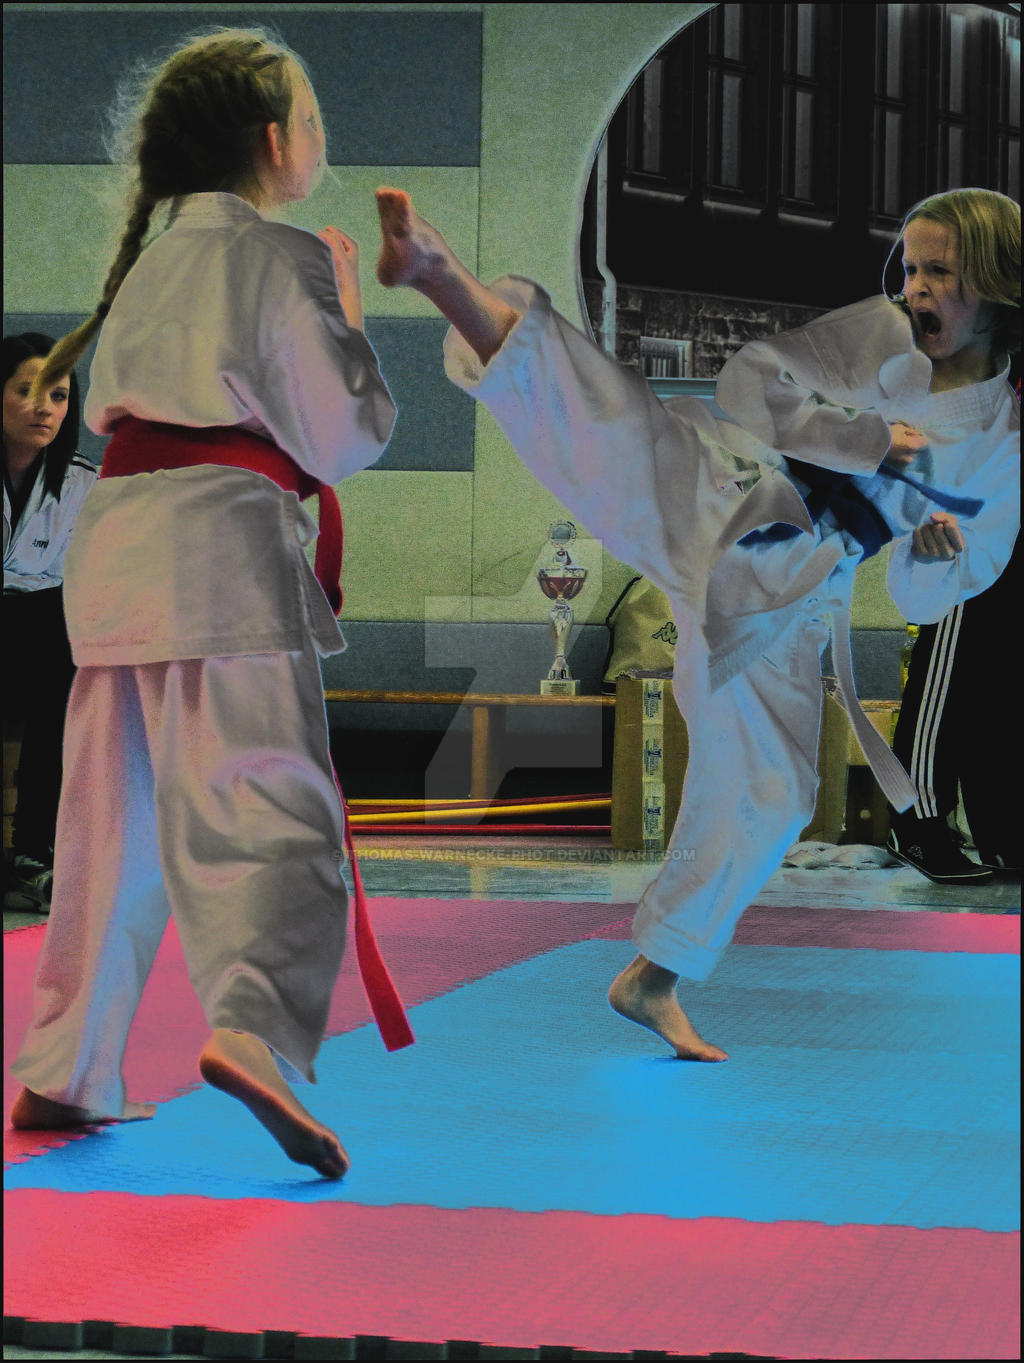 Karate kits by thomas-warnecke-phot